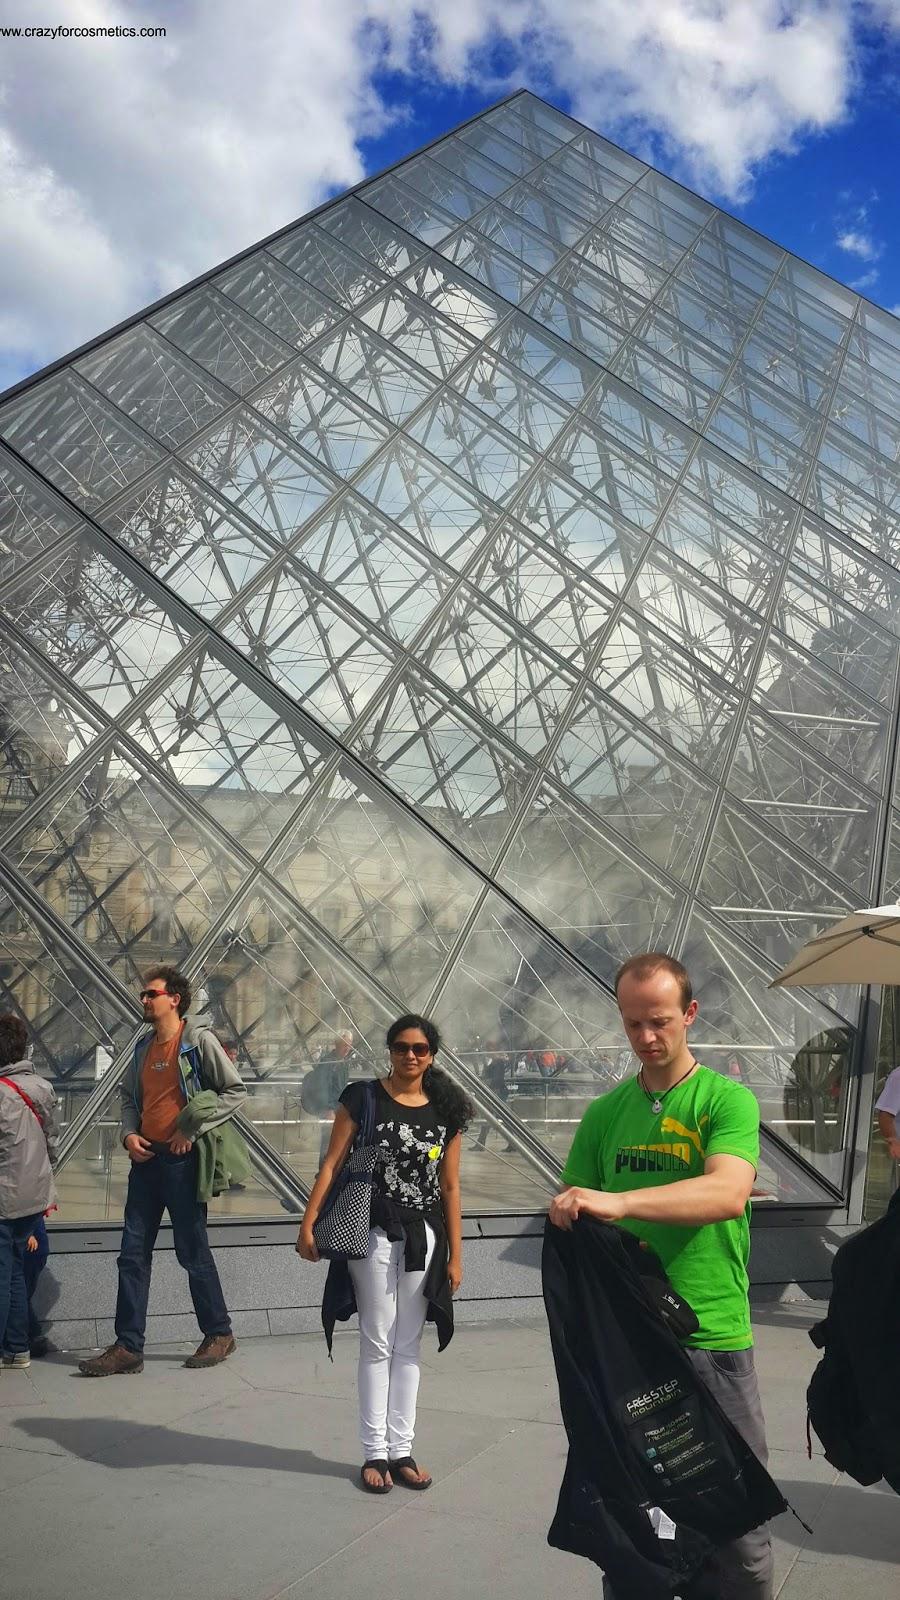 Europe Trip-Trip to Europe tips-Switzerland & Paris trip tips- Blog about Paris & switzerland-Paris sightseeing-segway tour of Paris- Louvre Museum Paris-Notre Dame Cathedral paris- Eiffel tower tour Paris